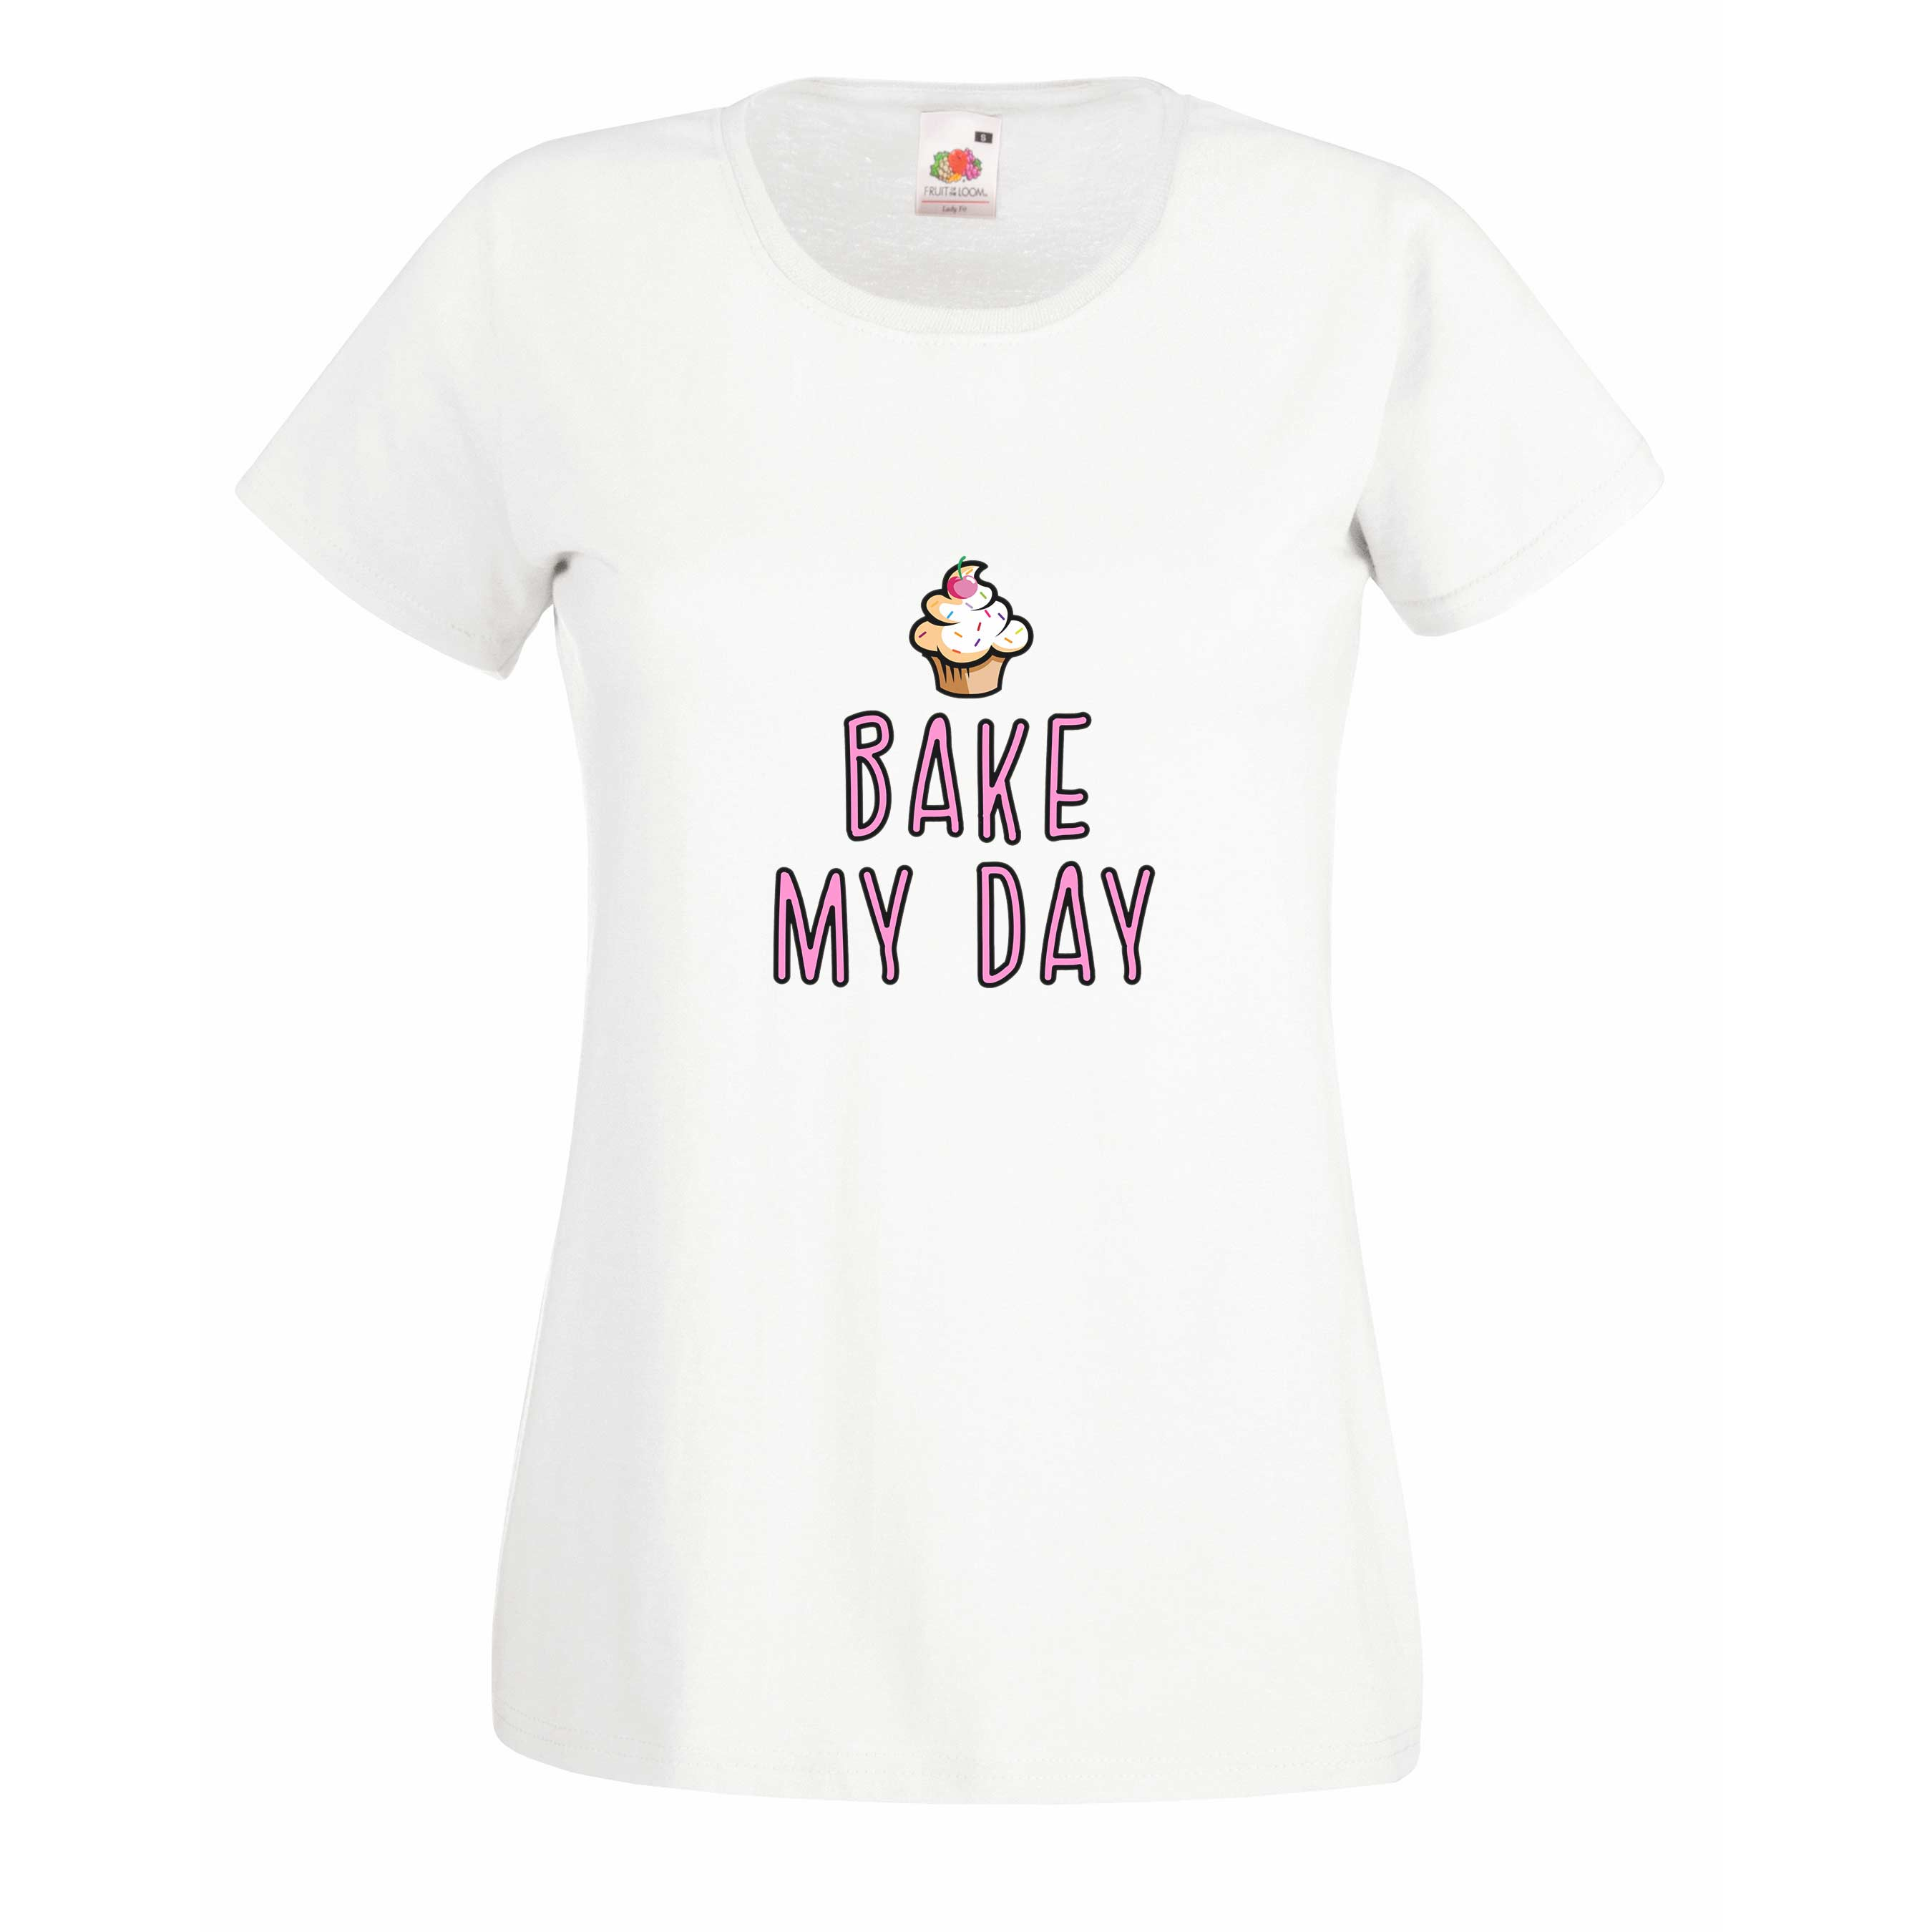 Bake my day design for t-shirt, hoodie & sweatshirt